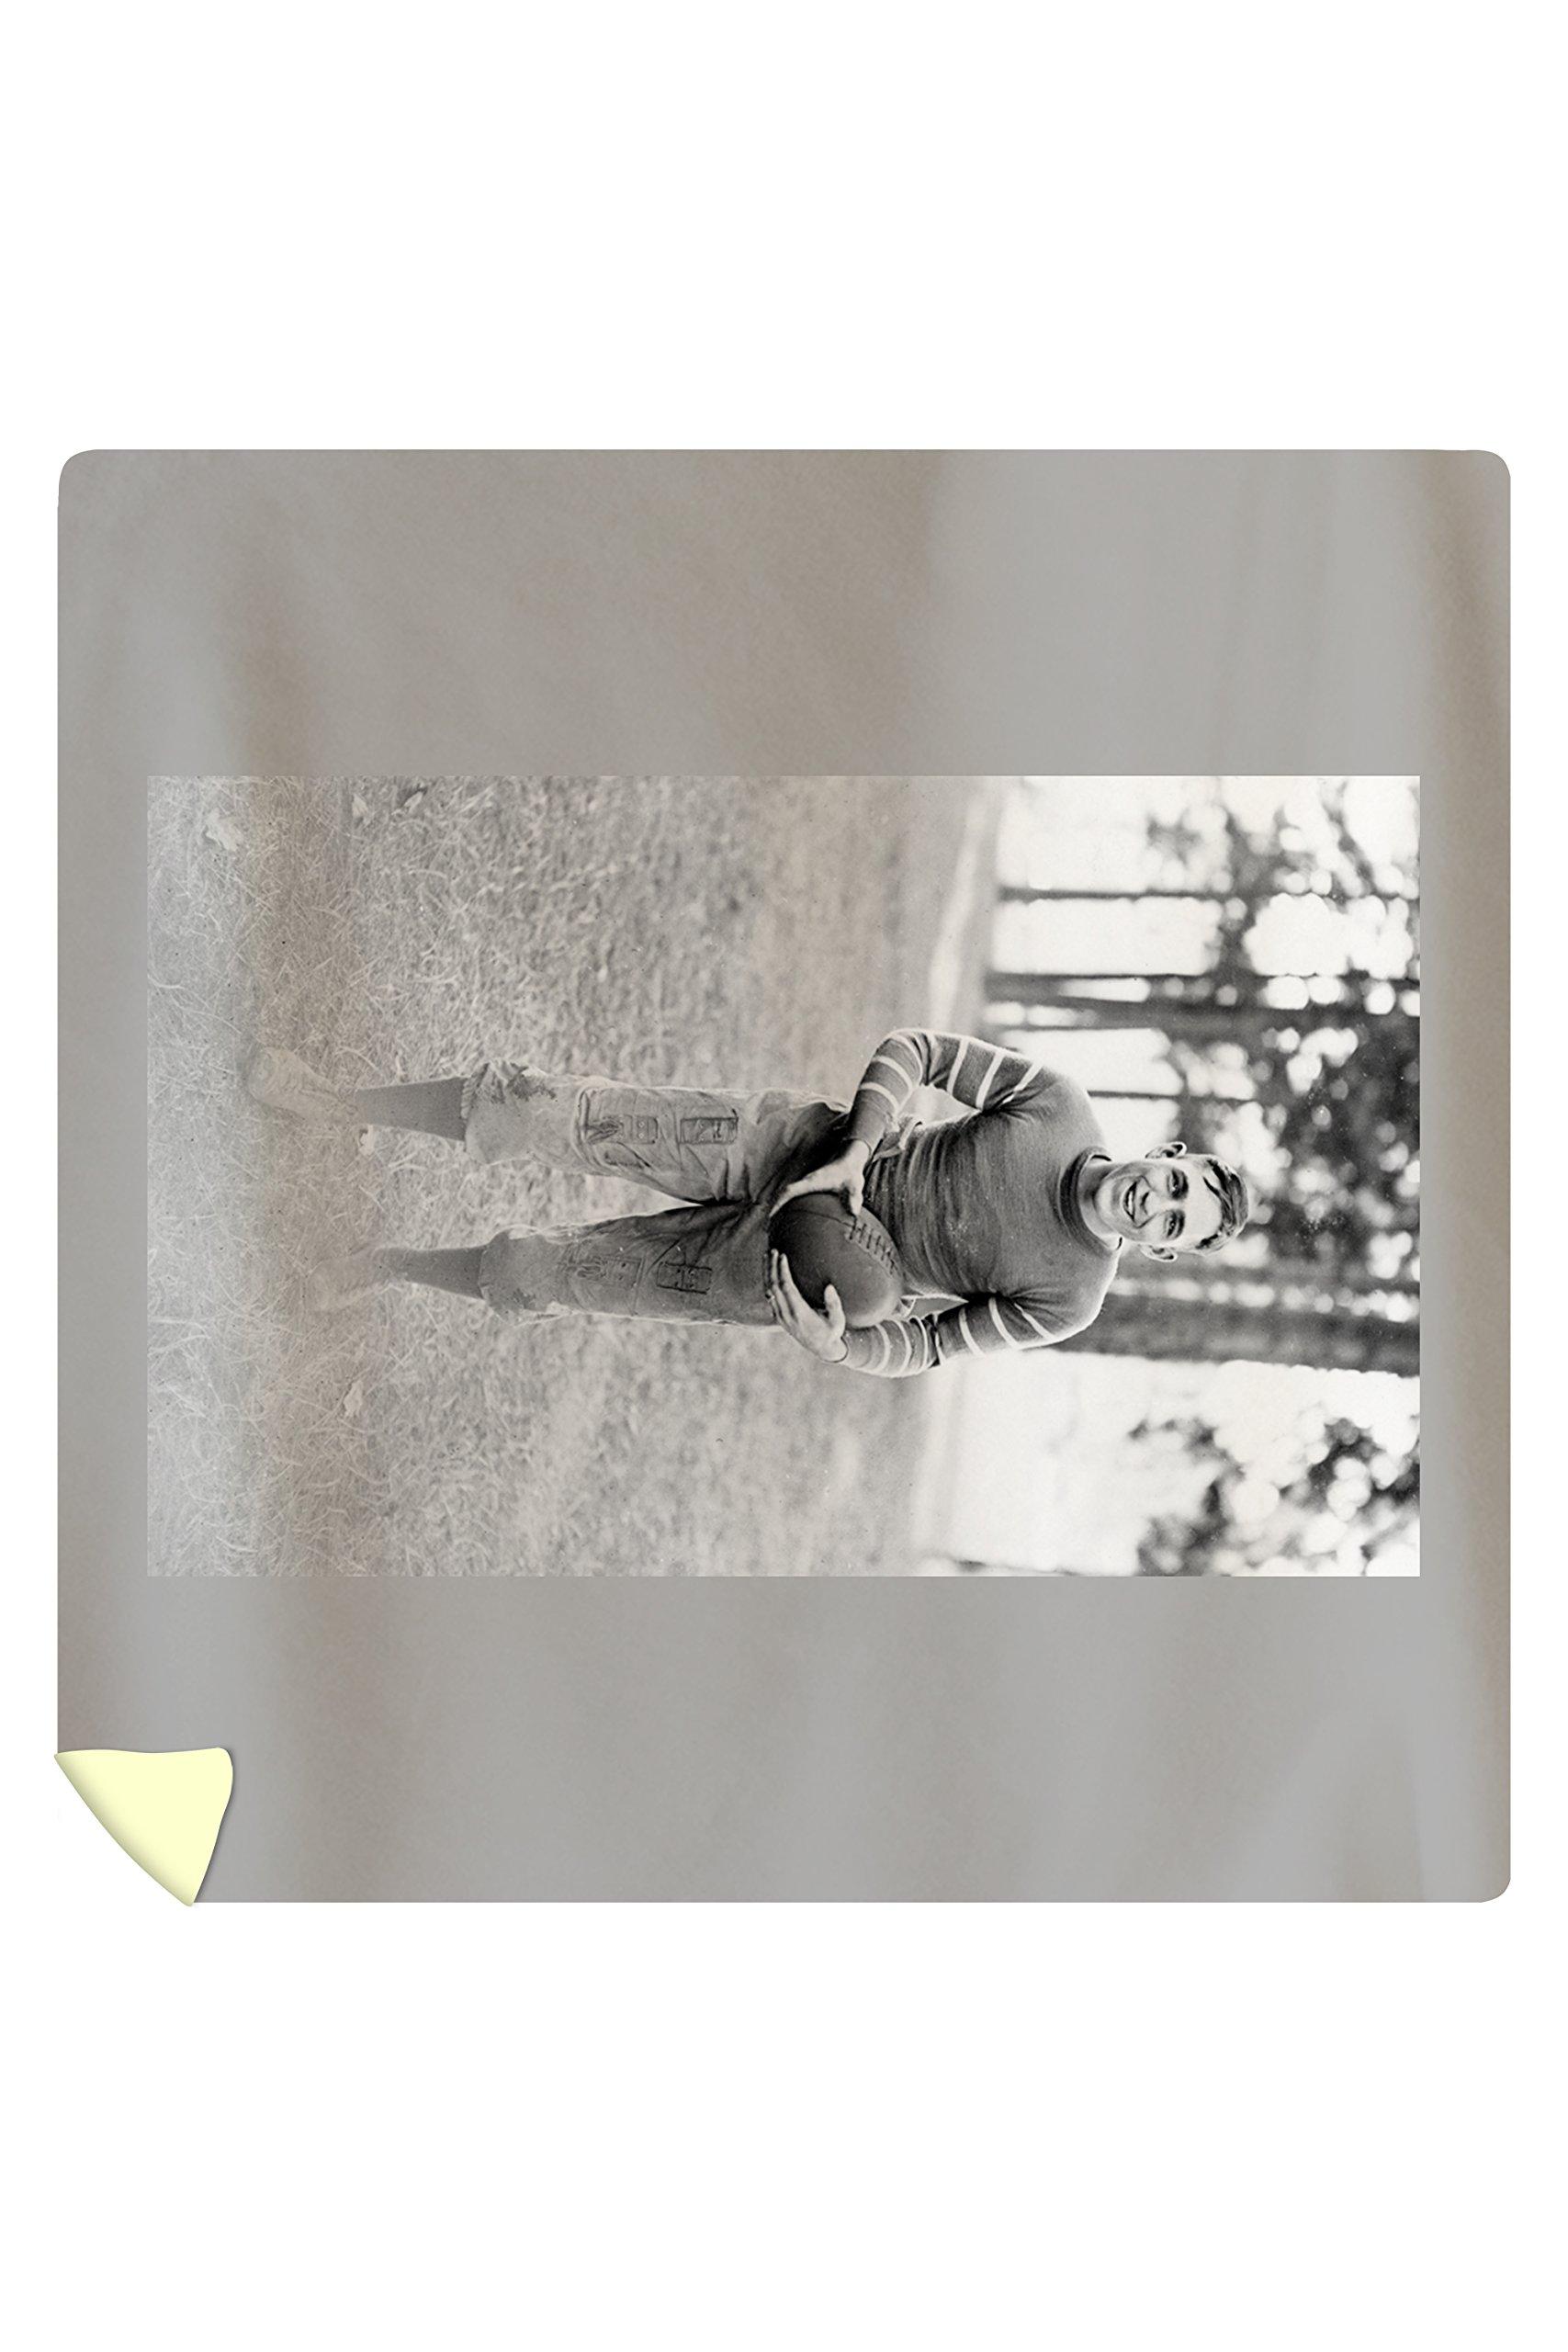 College Football Player in full gear Photograph (88x88 Queen Microfiber Duvet Cover)